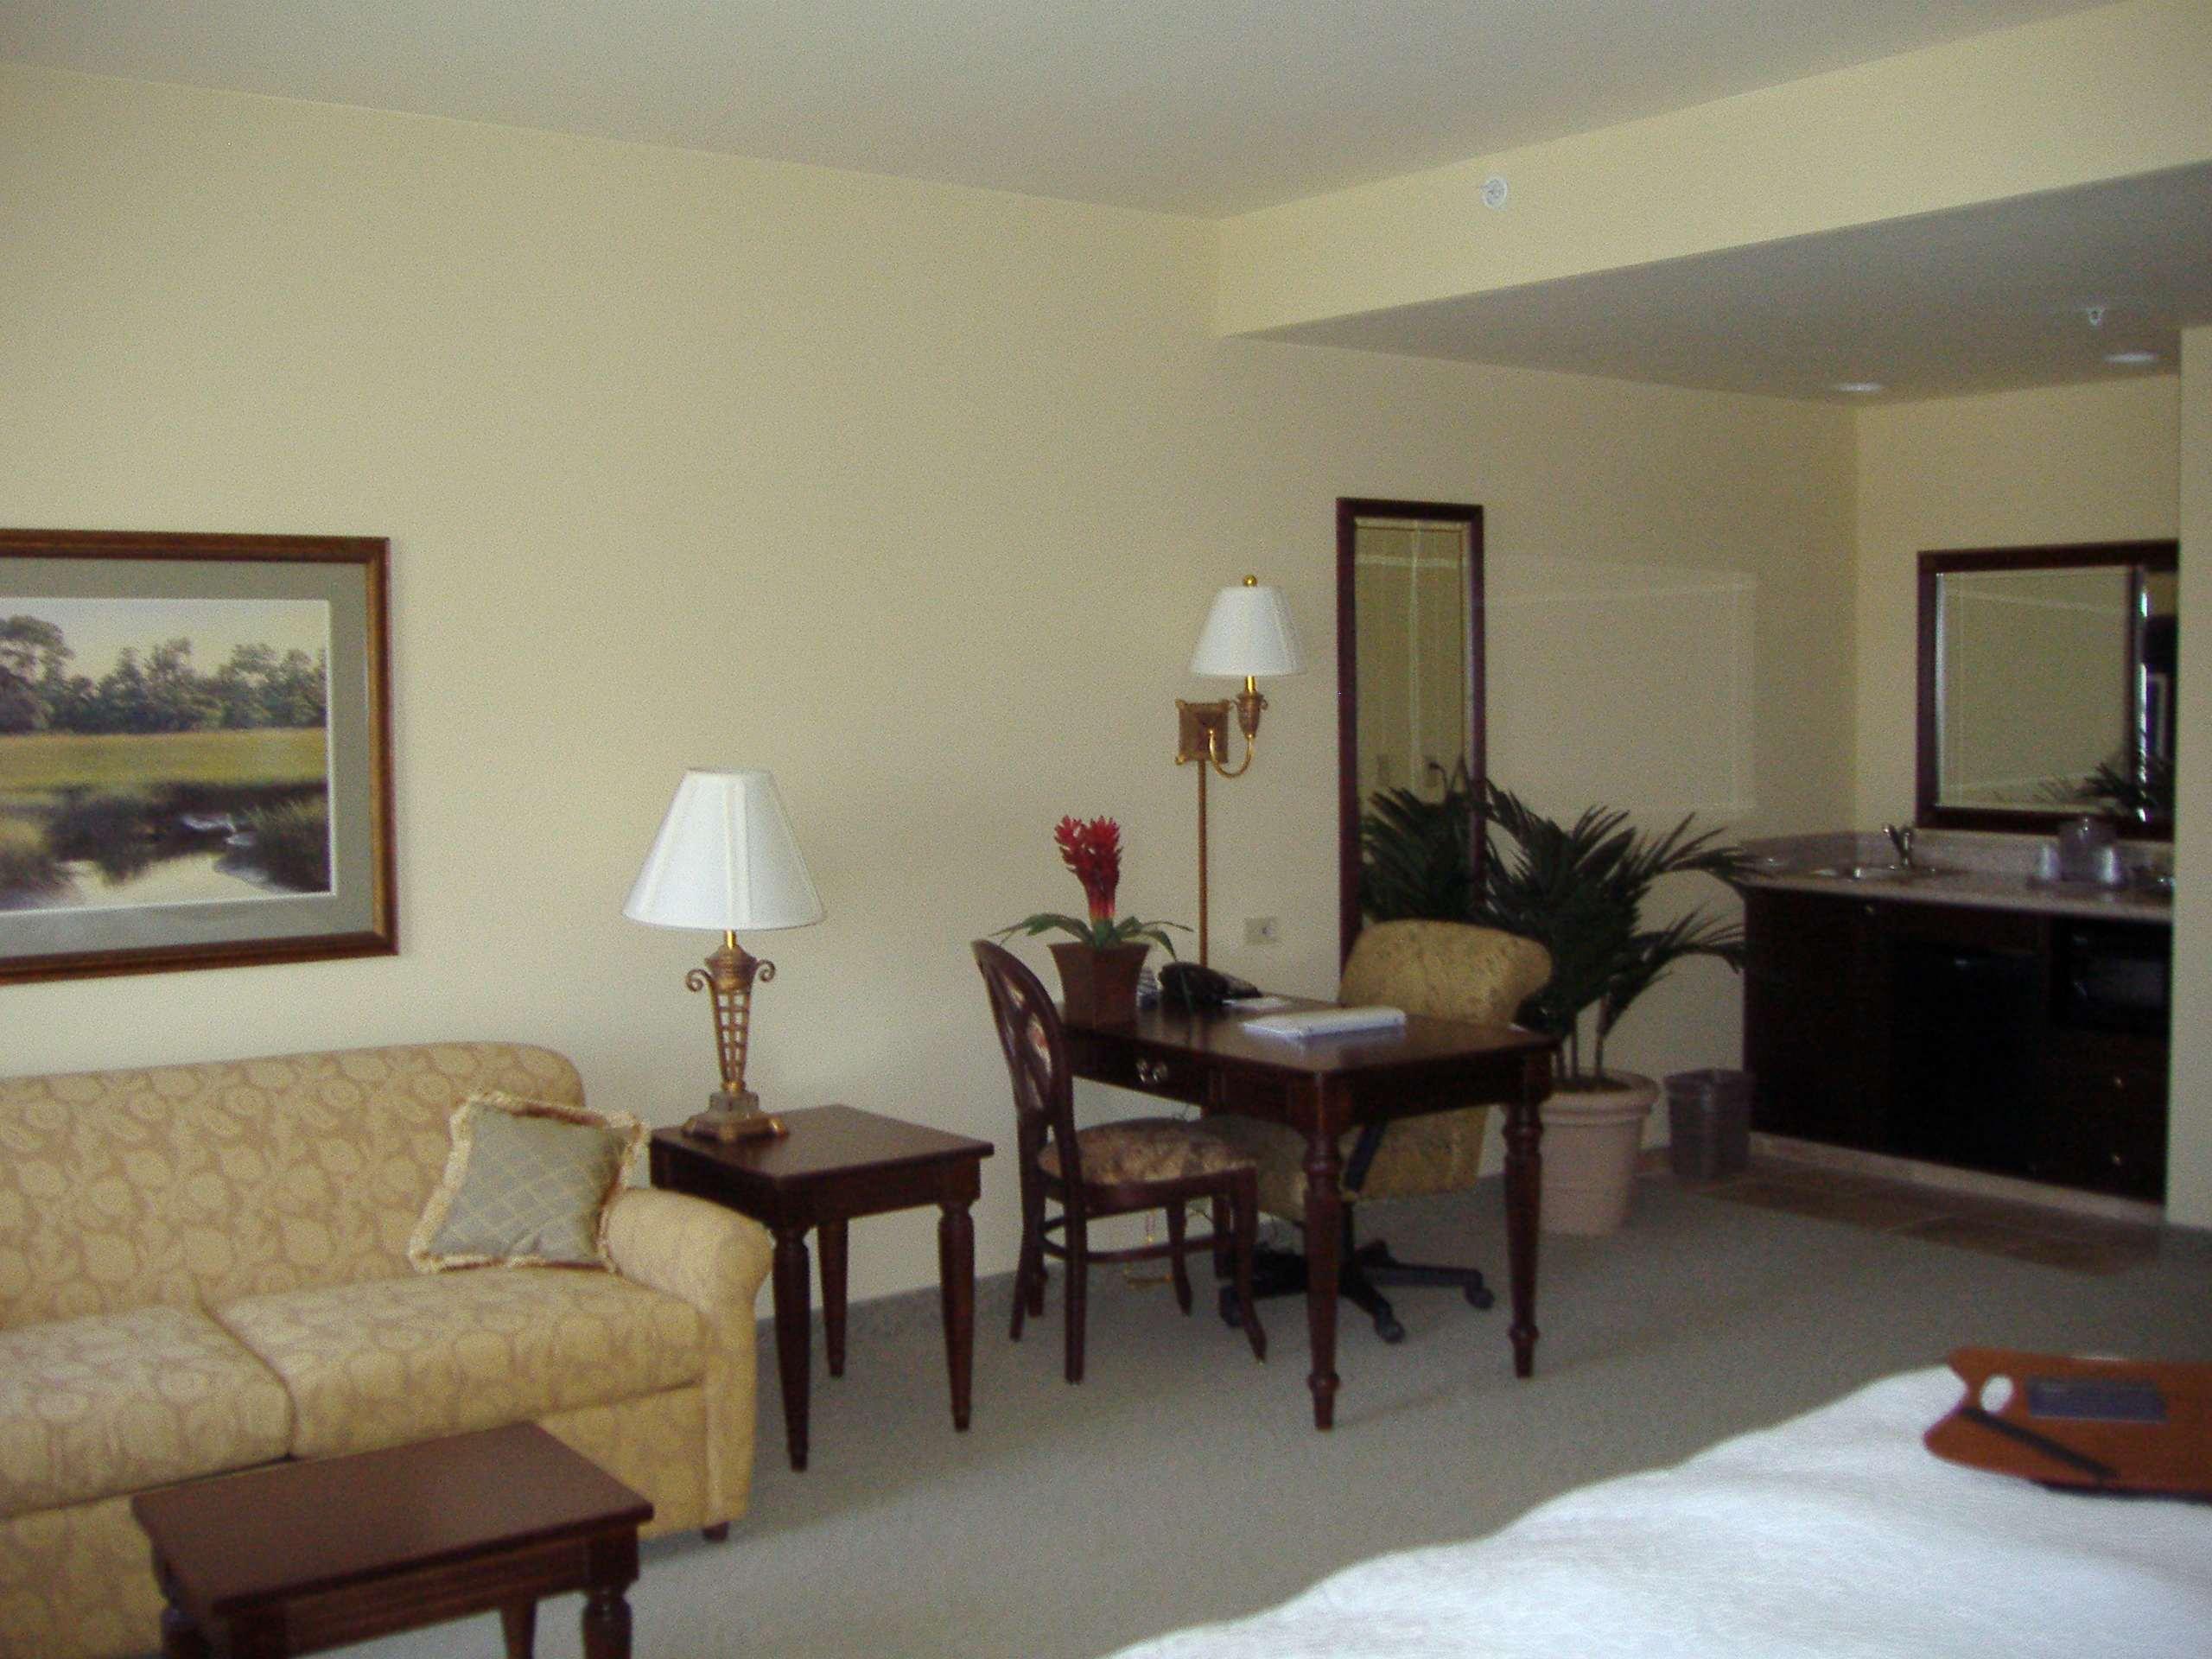 Hampton Inn & Suites Savannah Historic District image 32